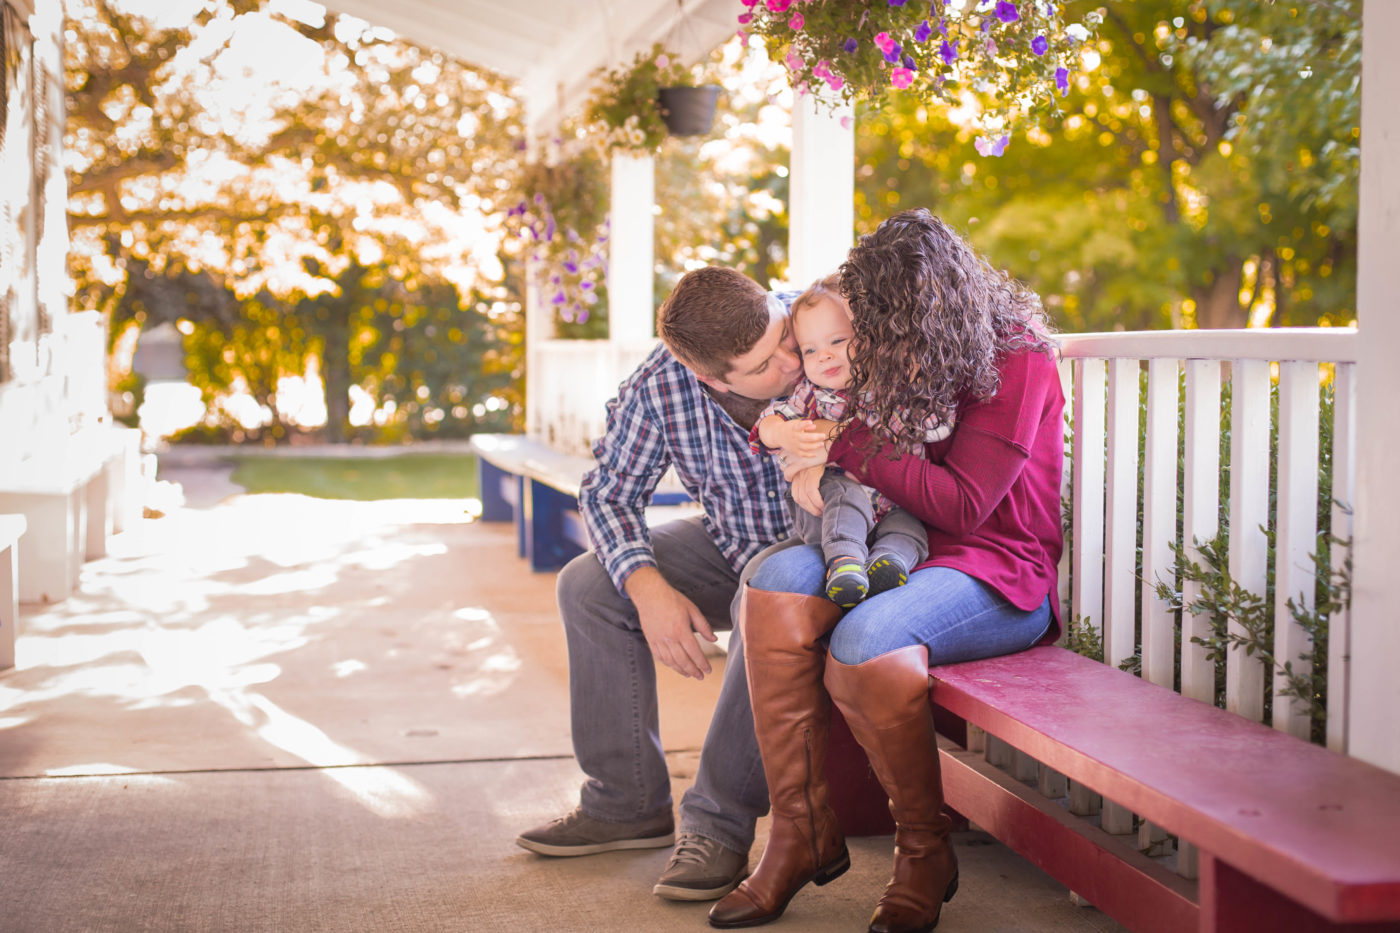 blumburg_highlandpark_child_photography-1-1400x933.jpg